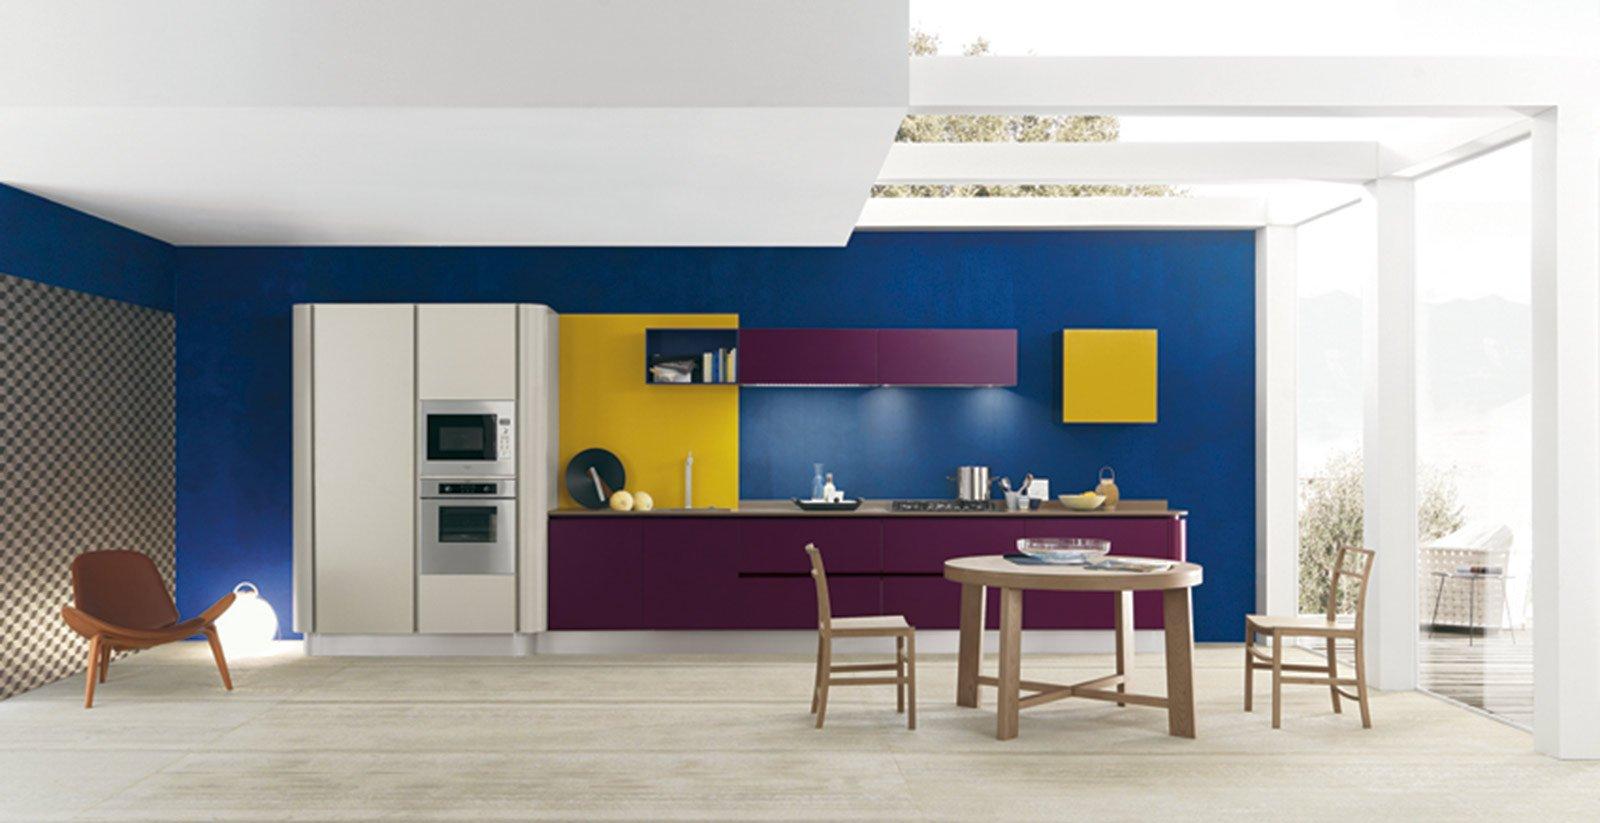 Cucine in laminato cose di casa - Cucina color melanzana ...